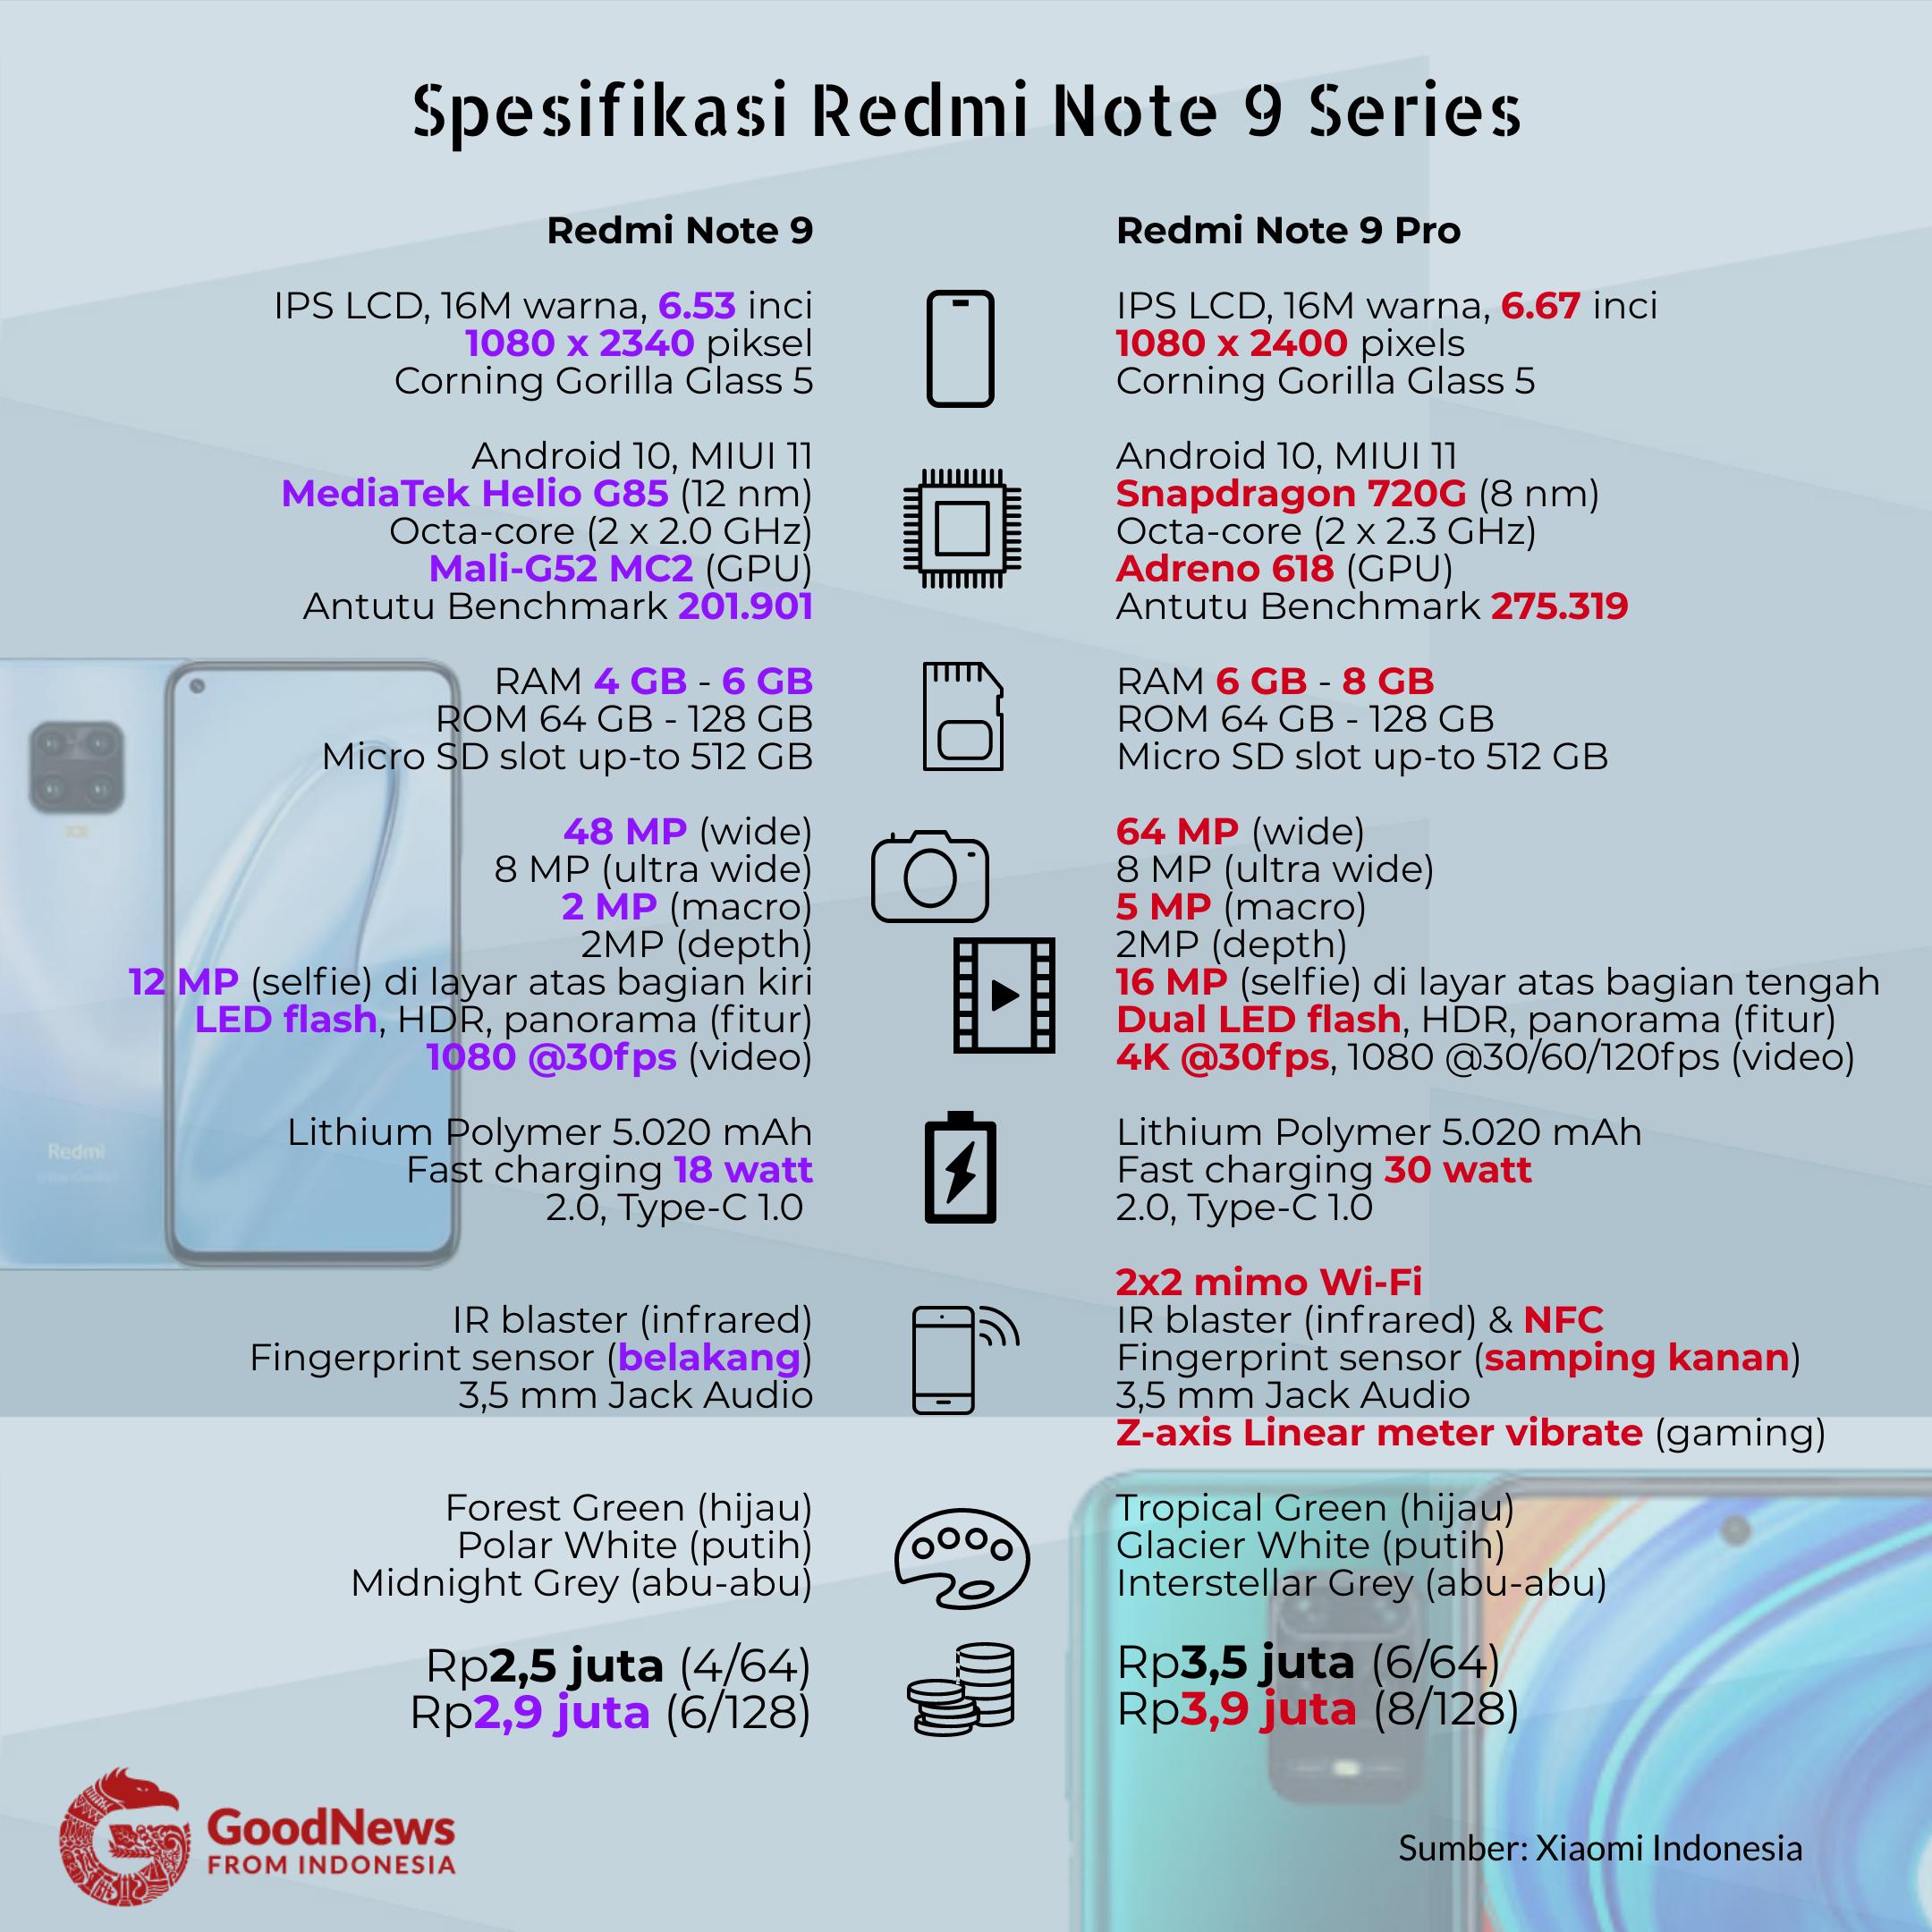 spesifikasi ponsel Redmi Note 9 series